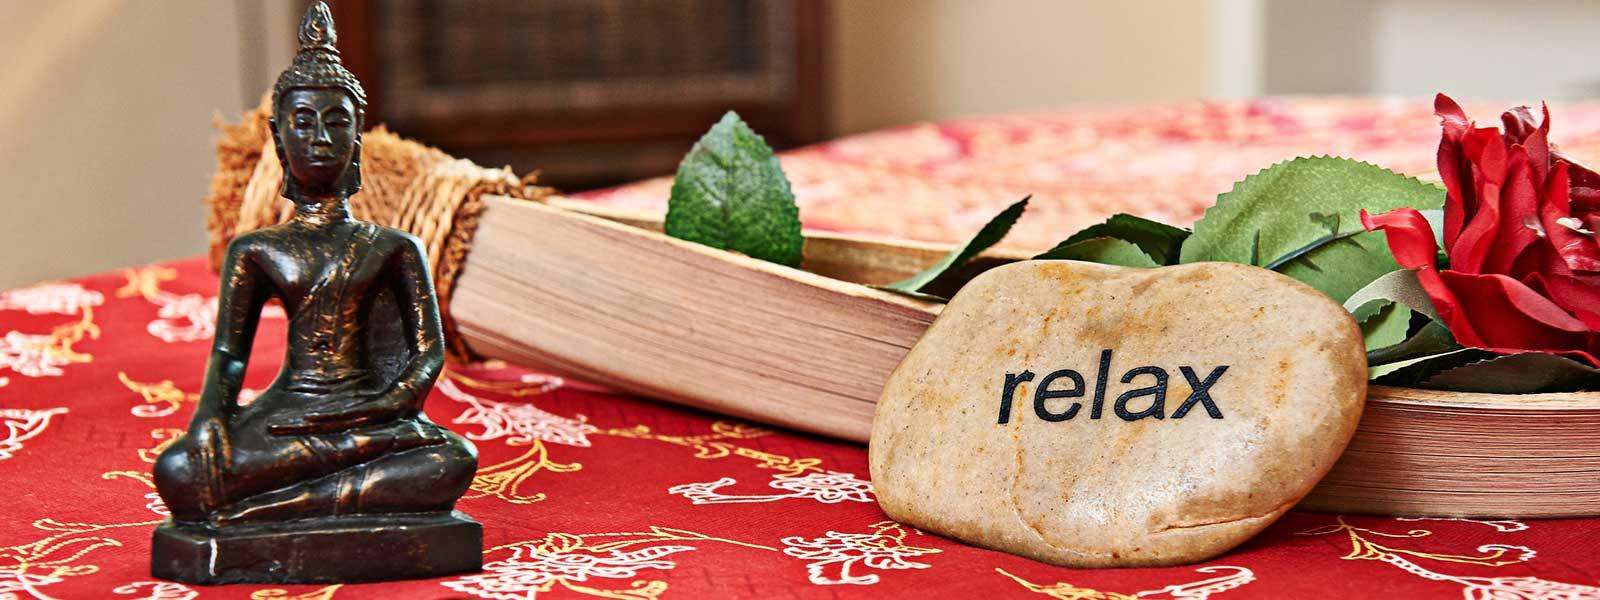 Ayurveda Erholung Entspannung Grassau